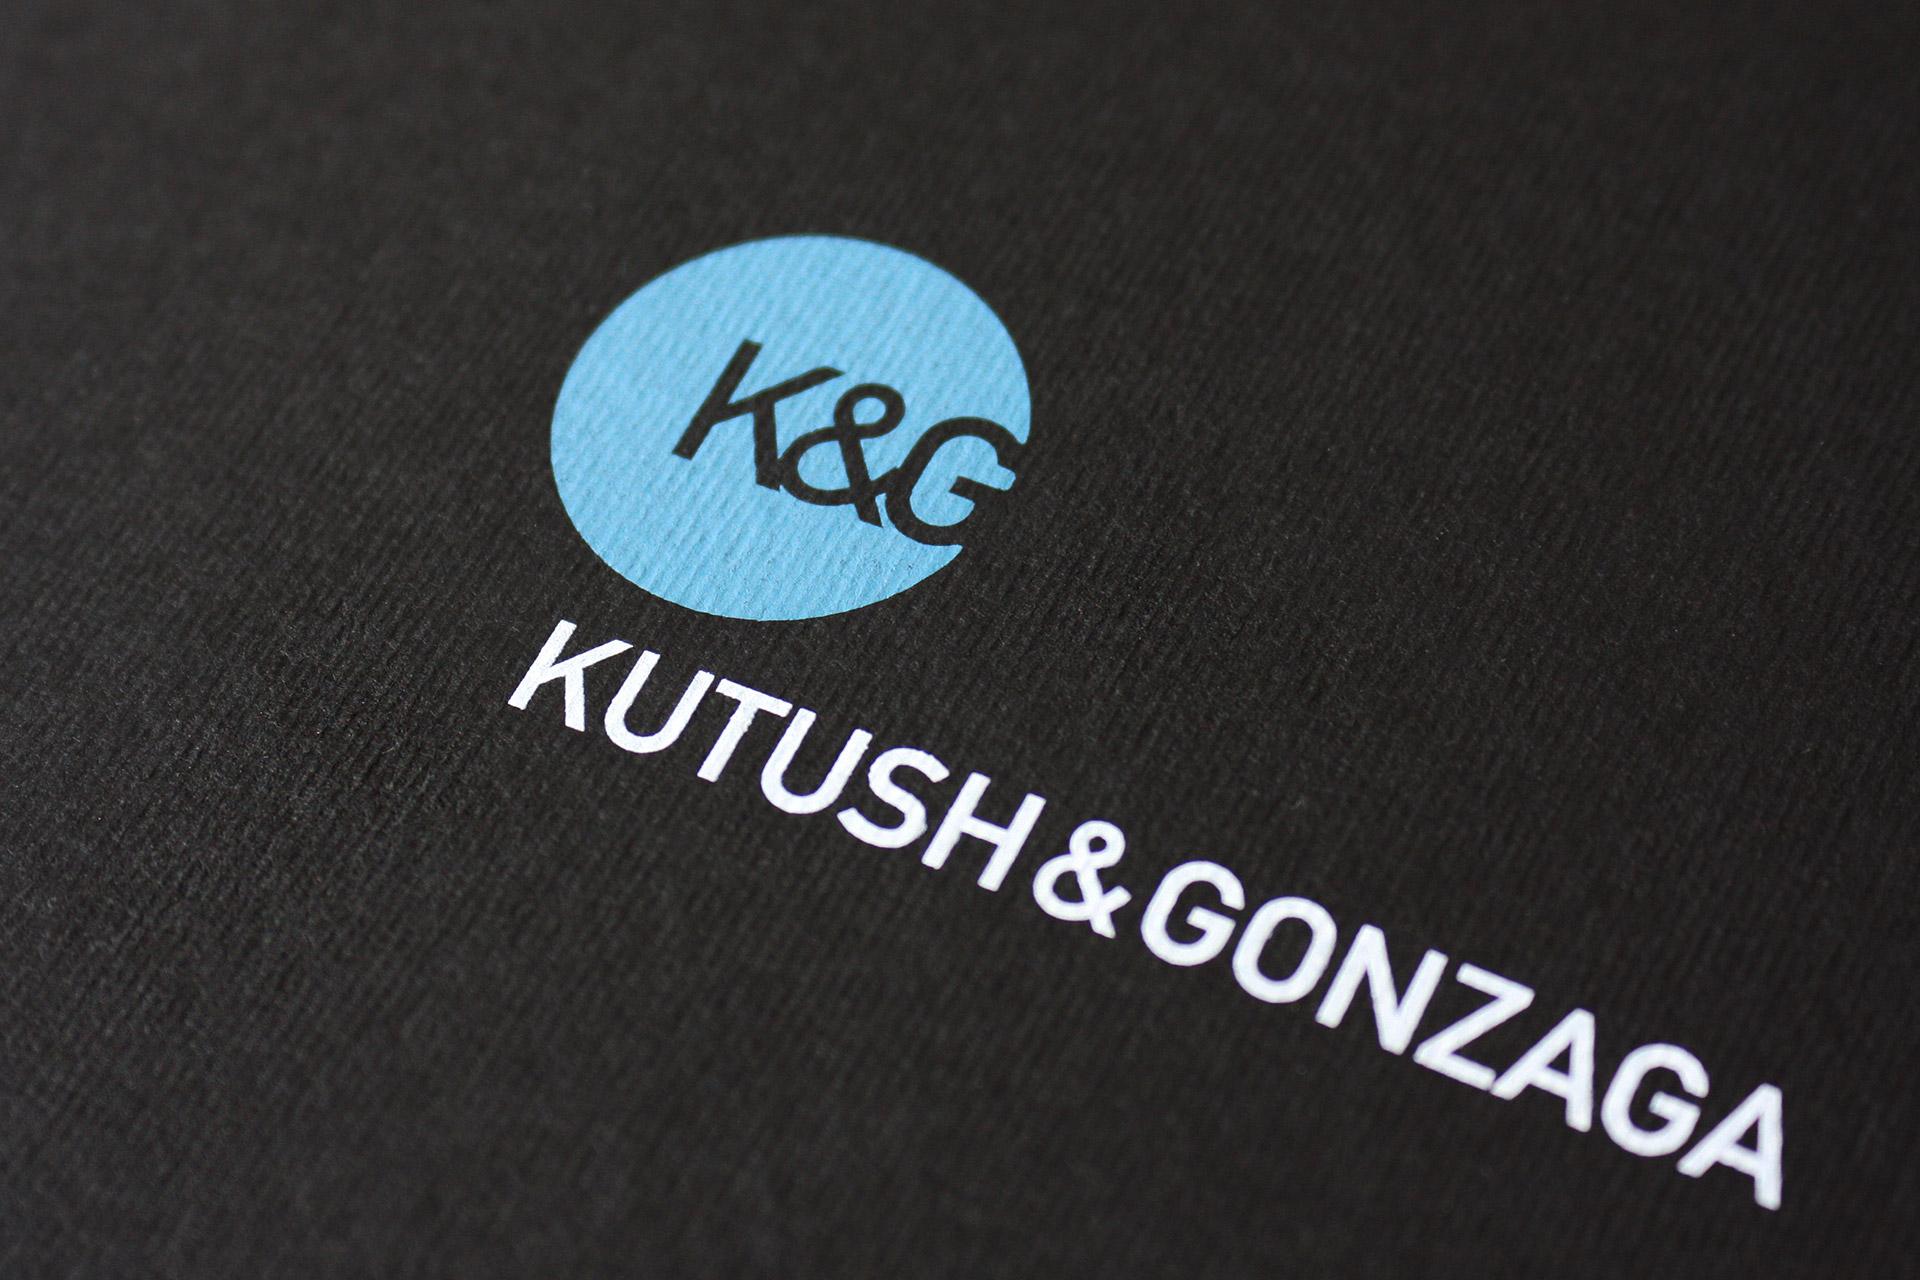 Asgard Branding, corporate identity, K&G, logo, Kutush & Gonzaga, design, logo design, store branding, online store, retaile, branding